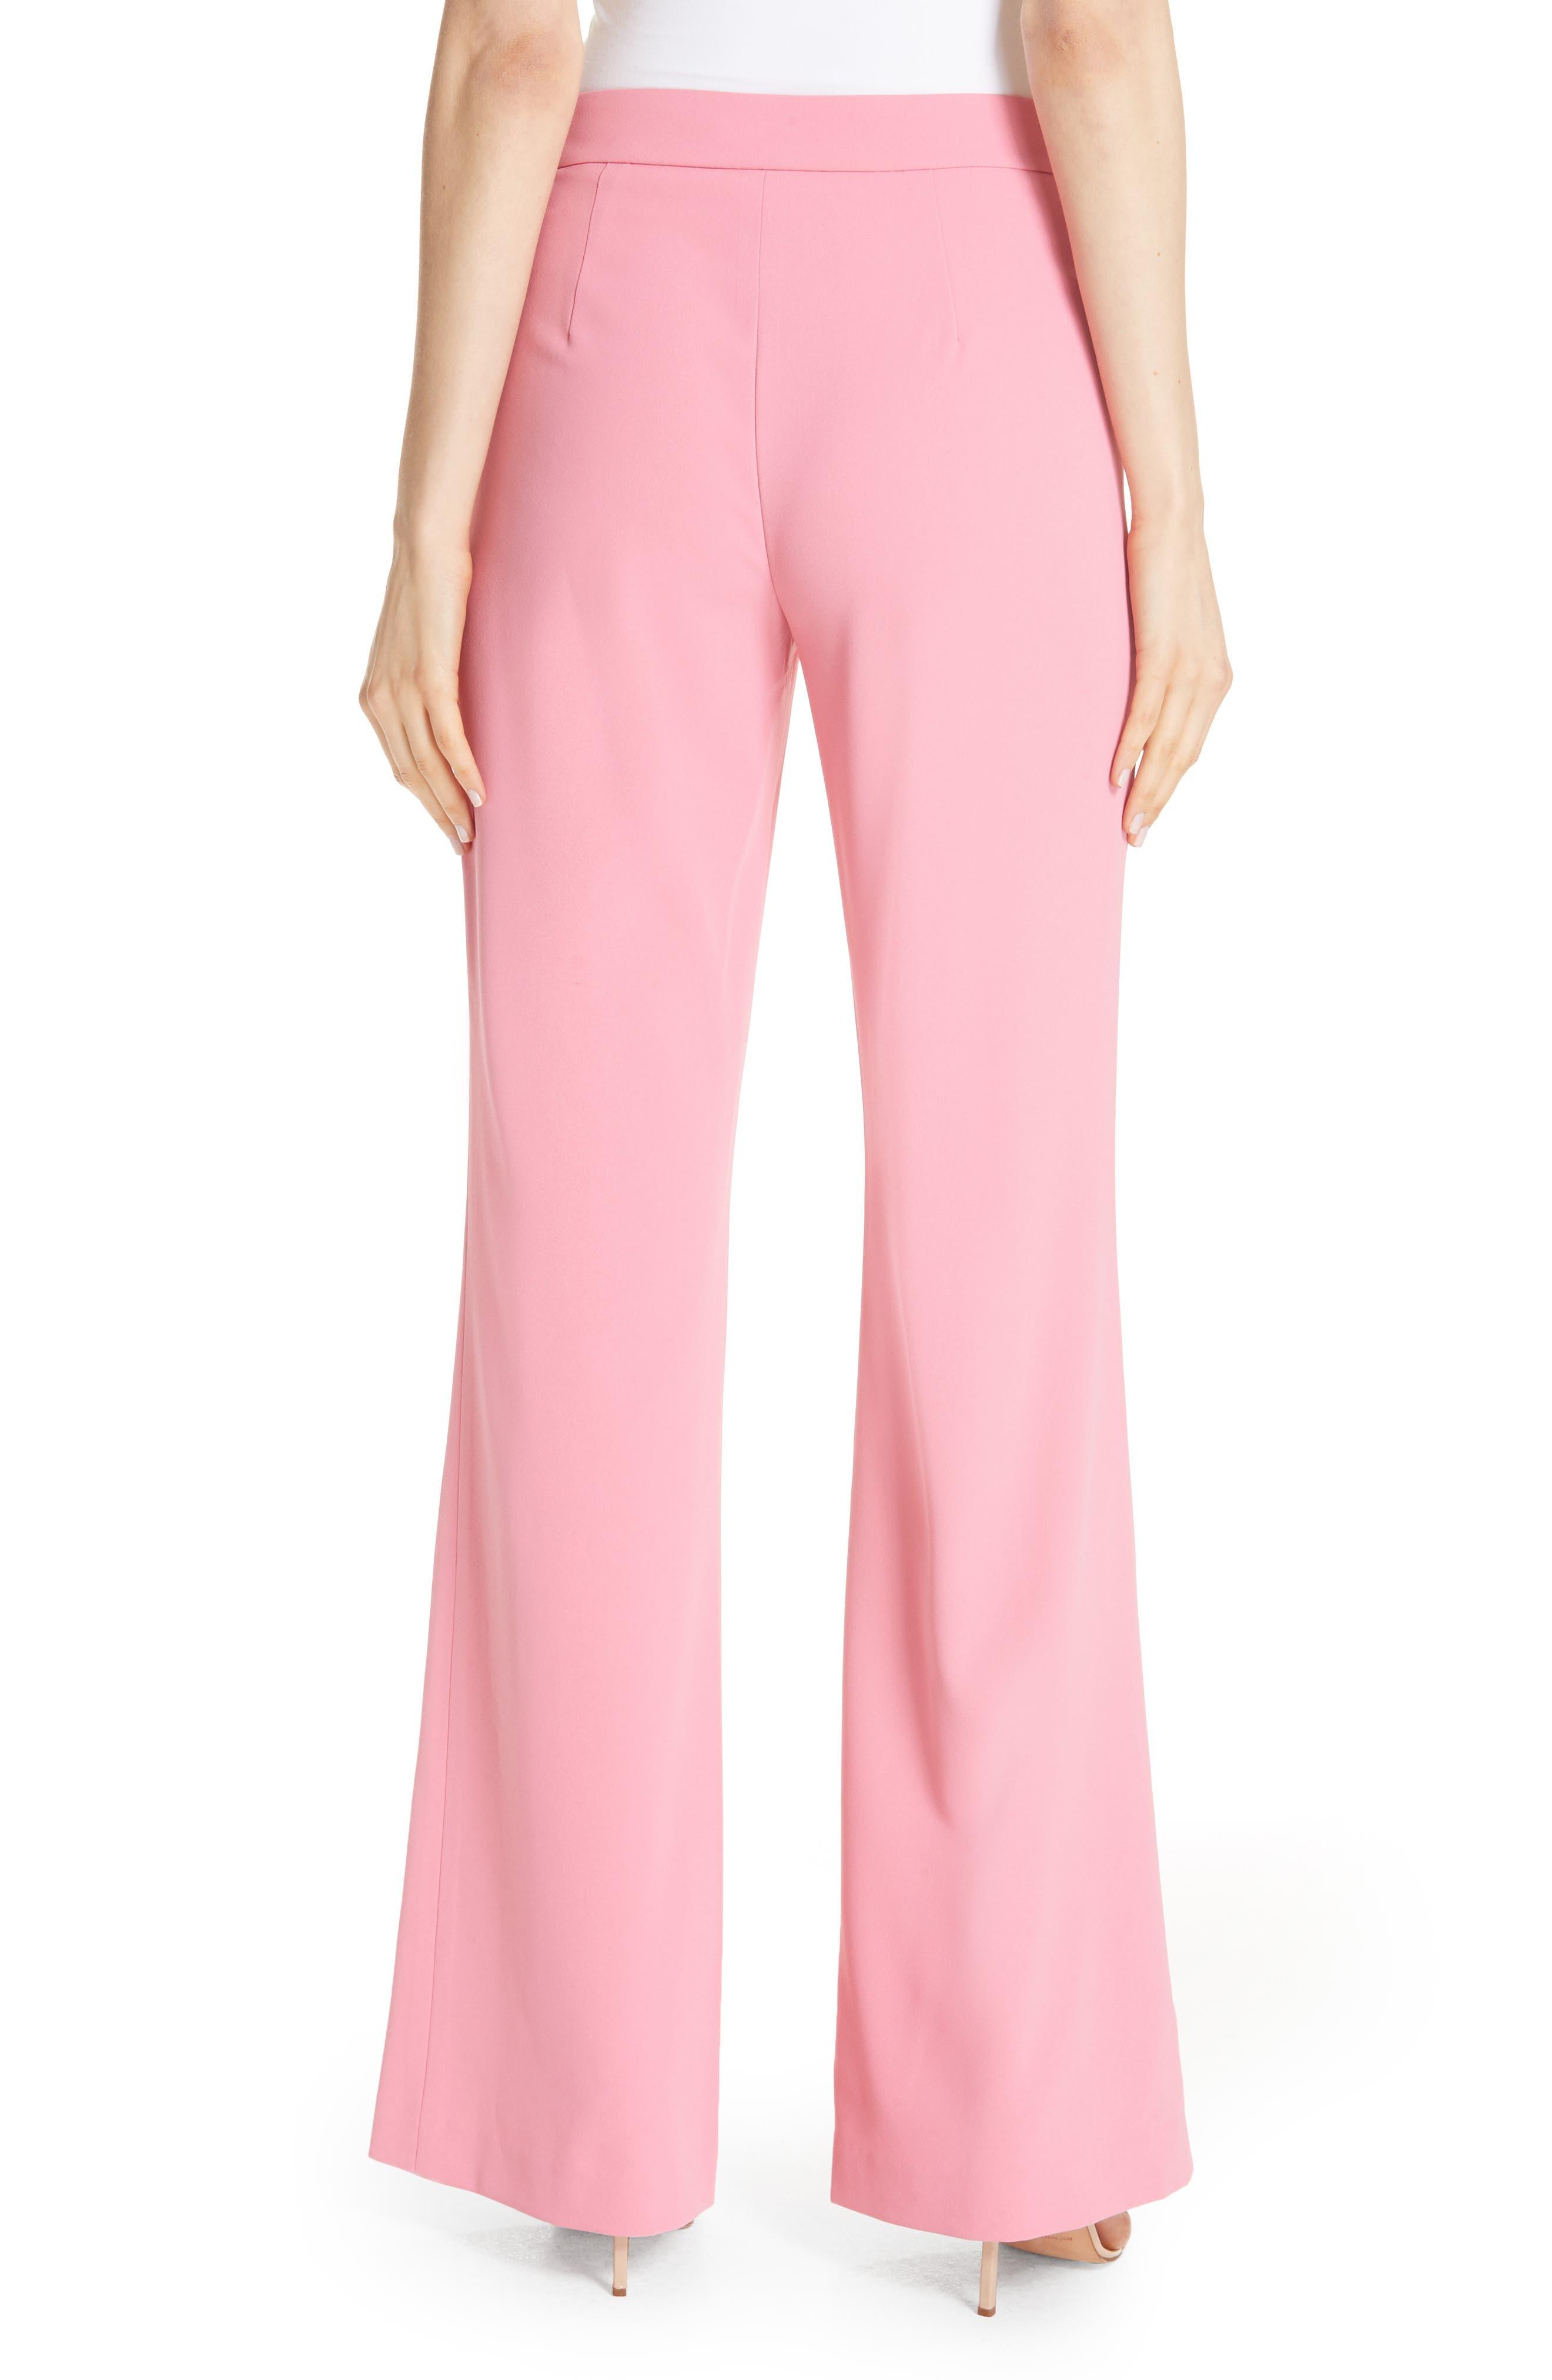 Jalisa High Waist Flare Pants,                             Alternate thumbnail 2, color,                             Bubblegum